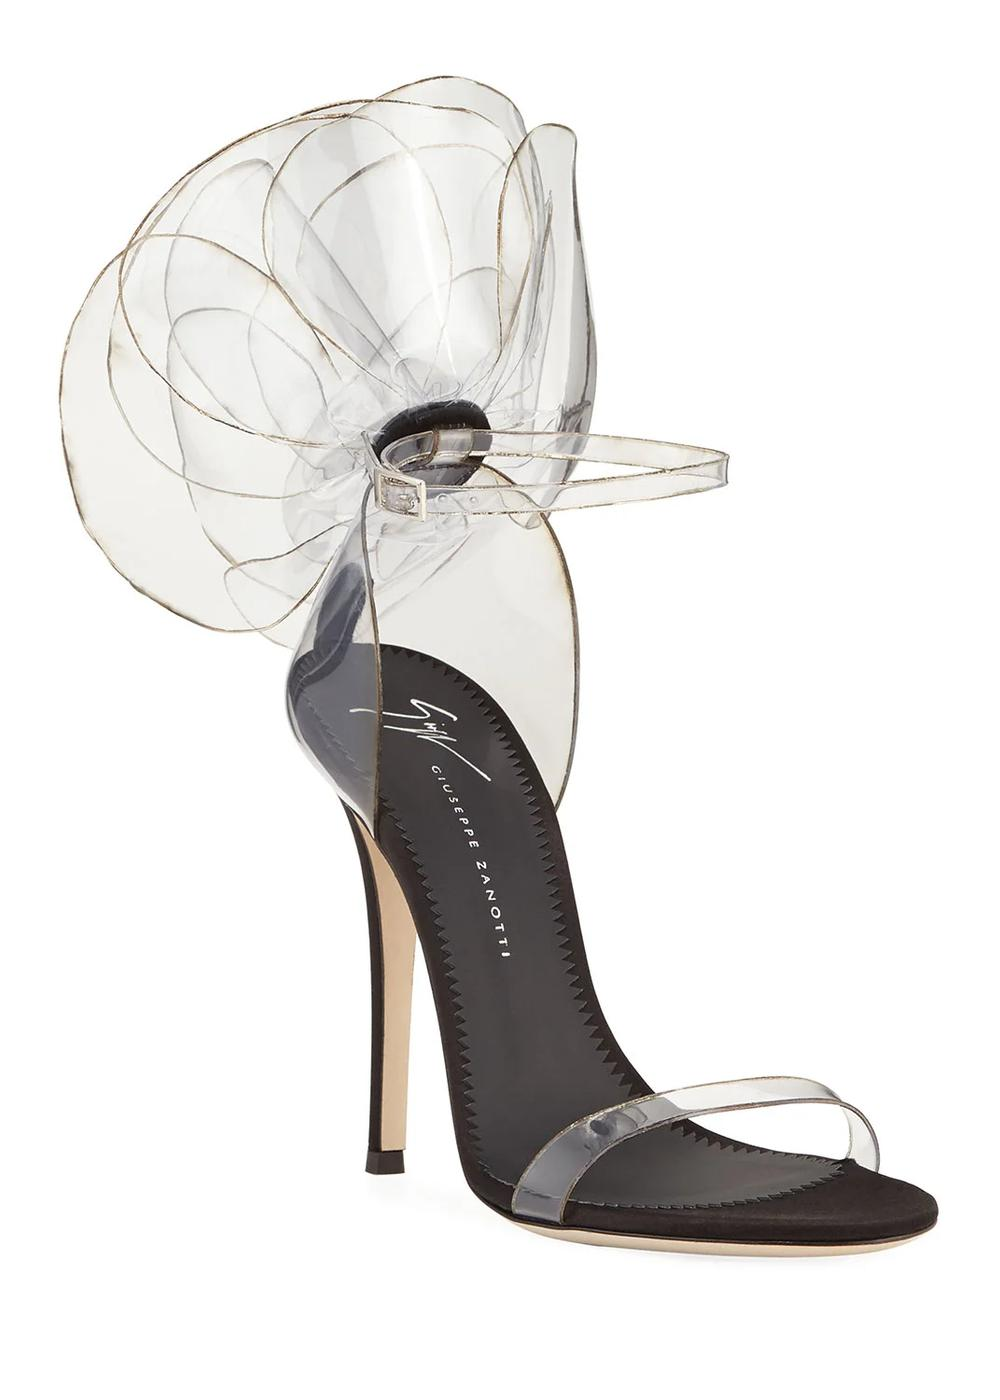 Neiman Marcus product